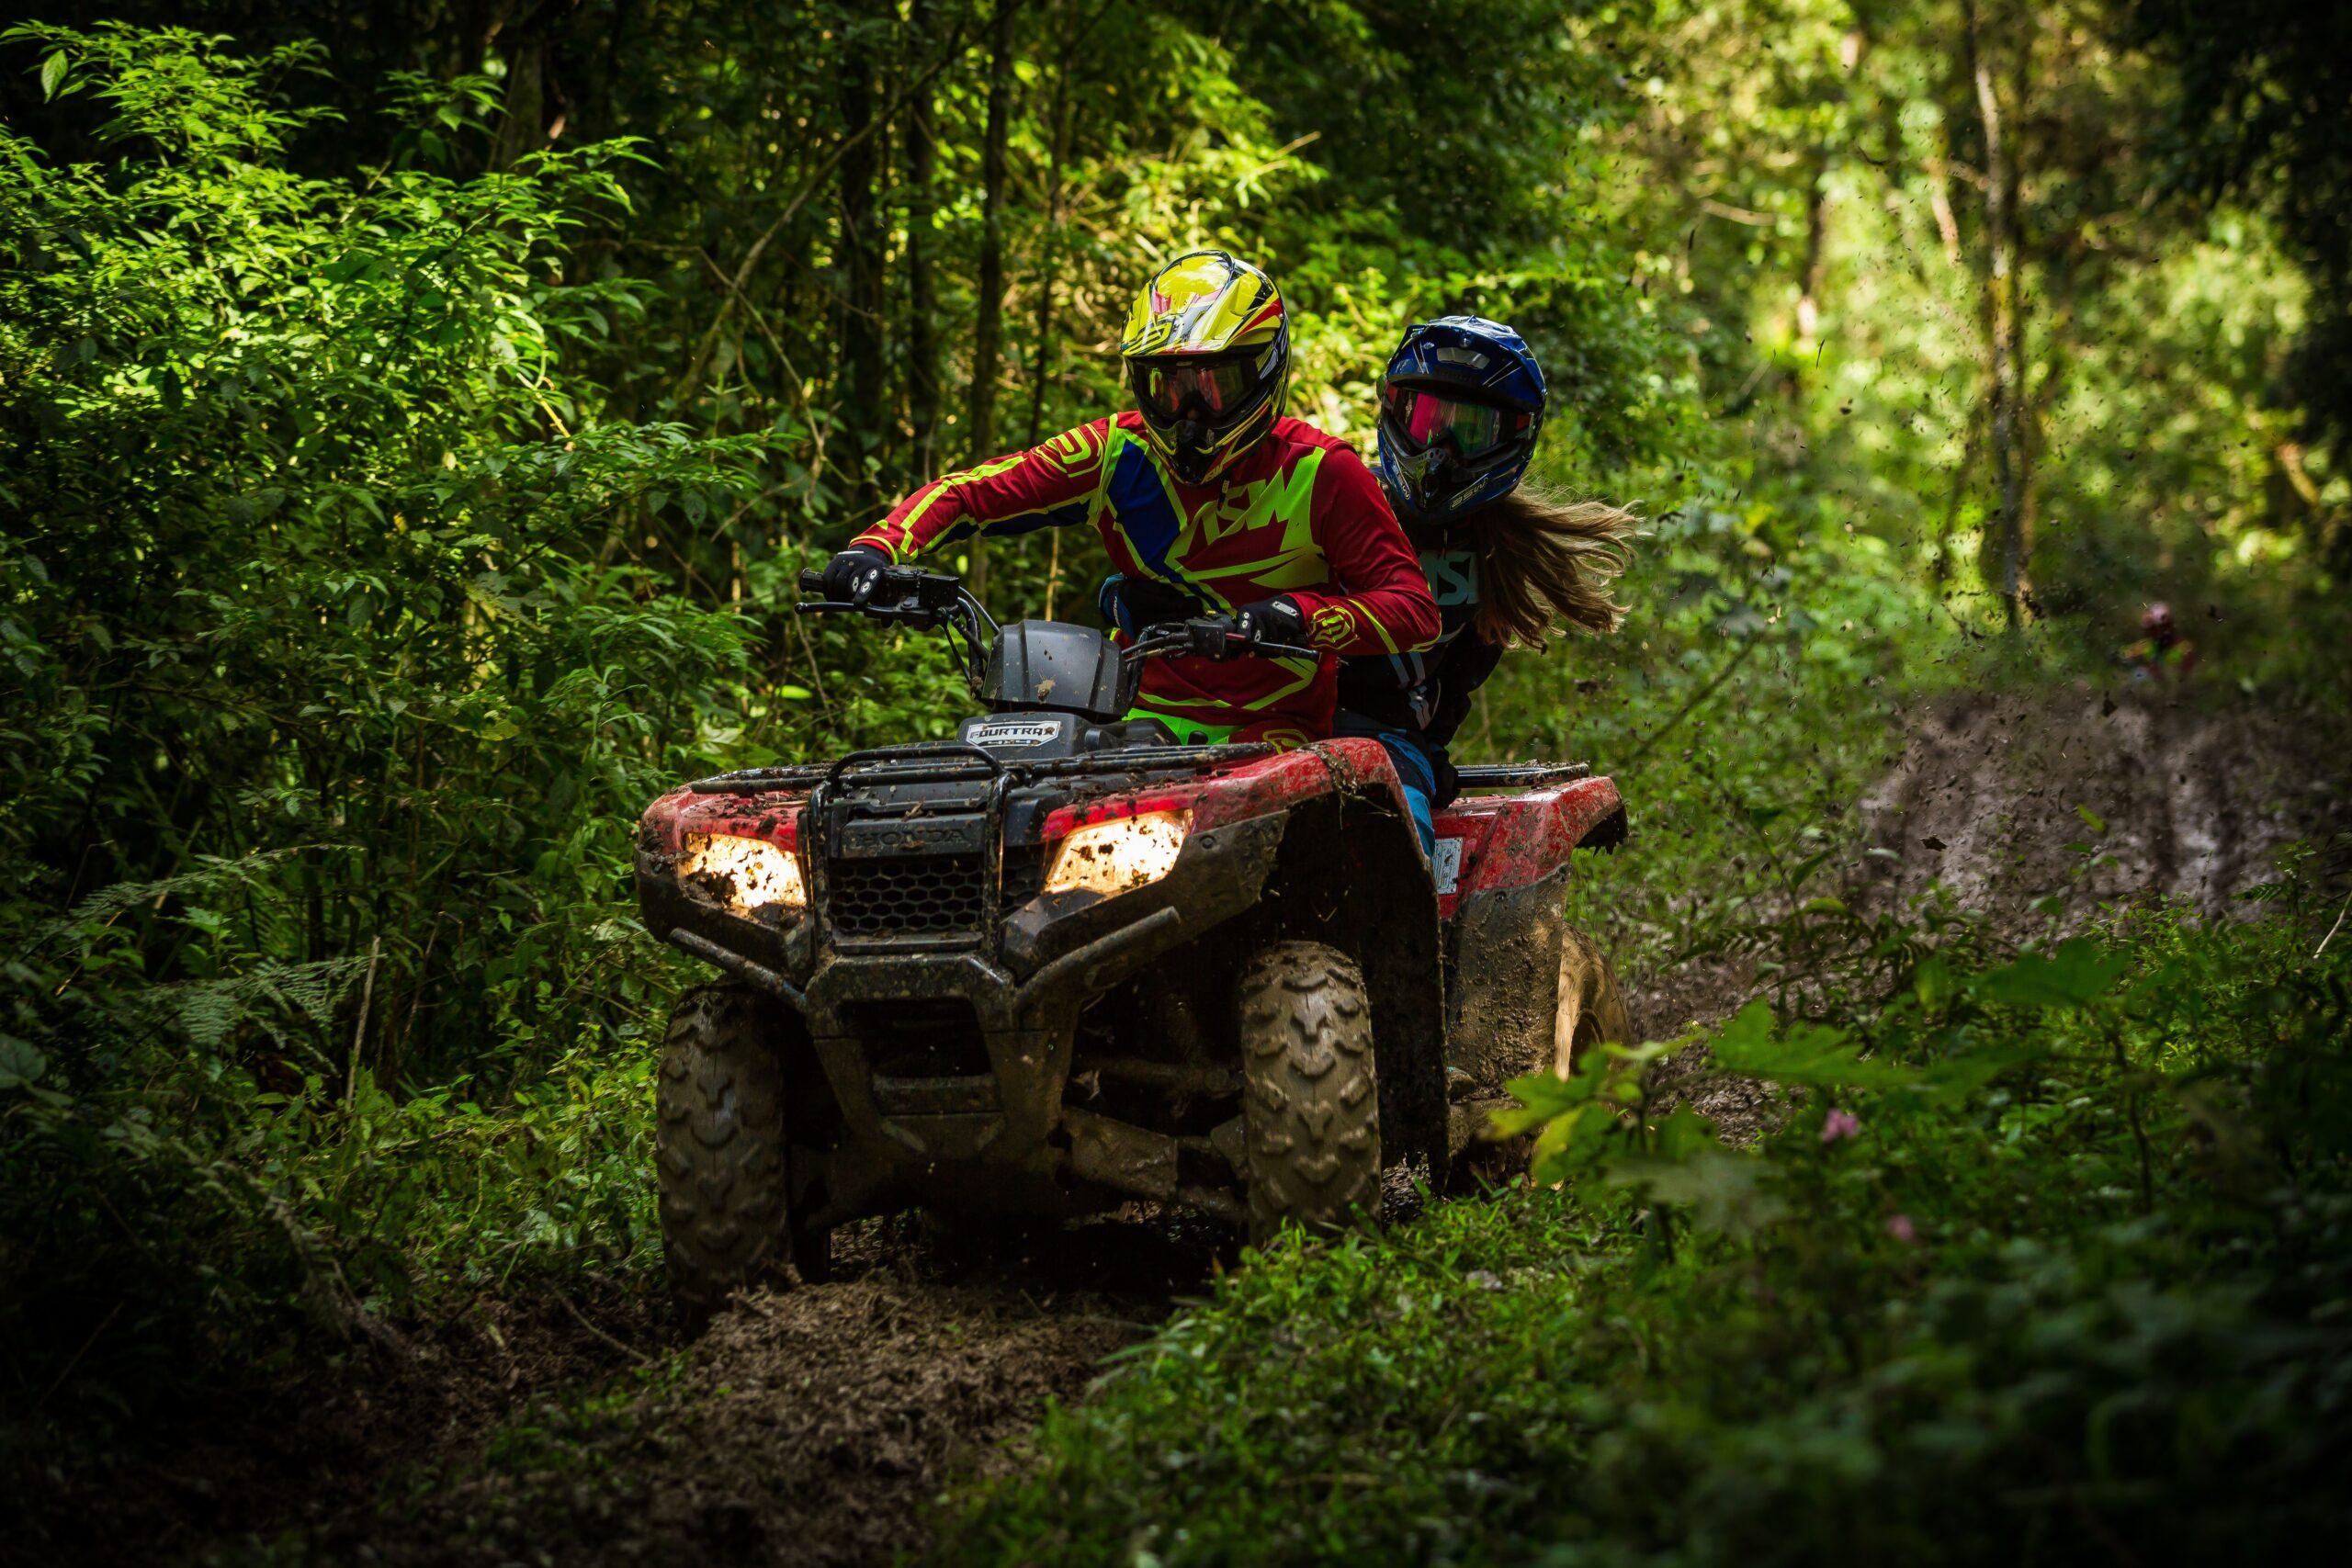 Trail ATV riding